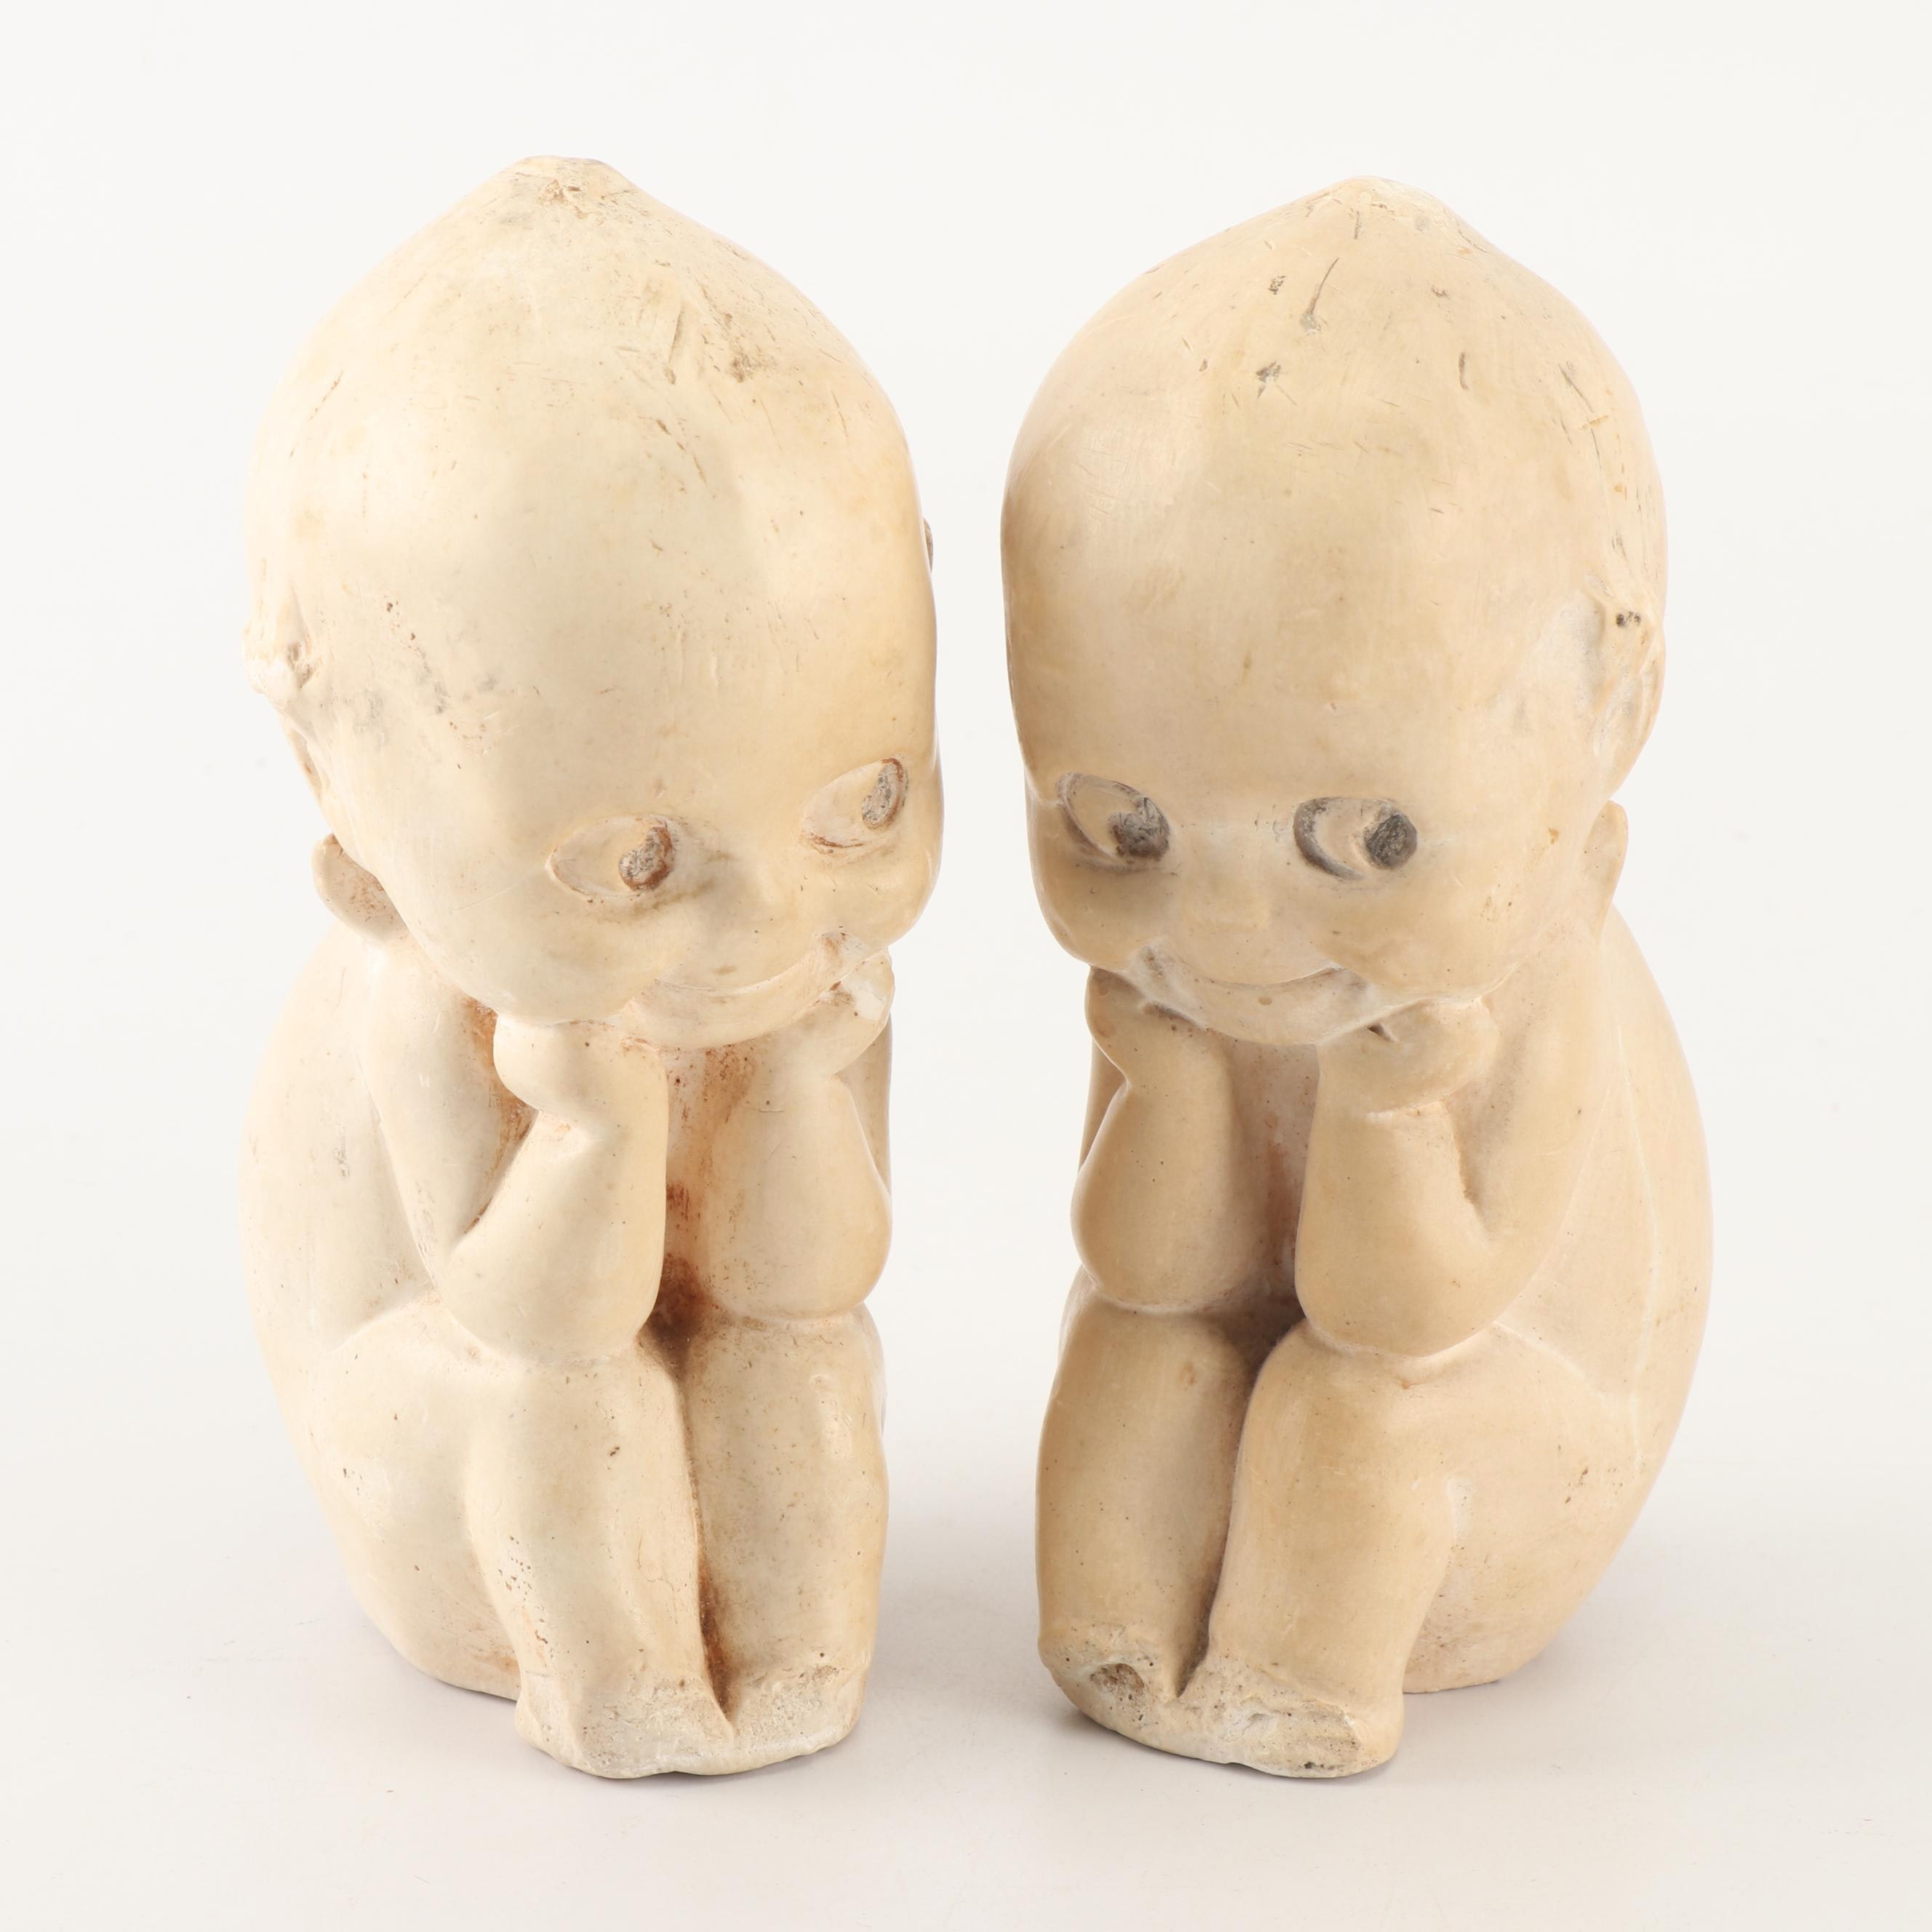 "Antique Chalkware Kewpie Doll ""The Thinker"" Figurines"